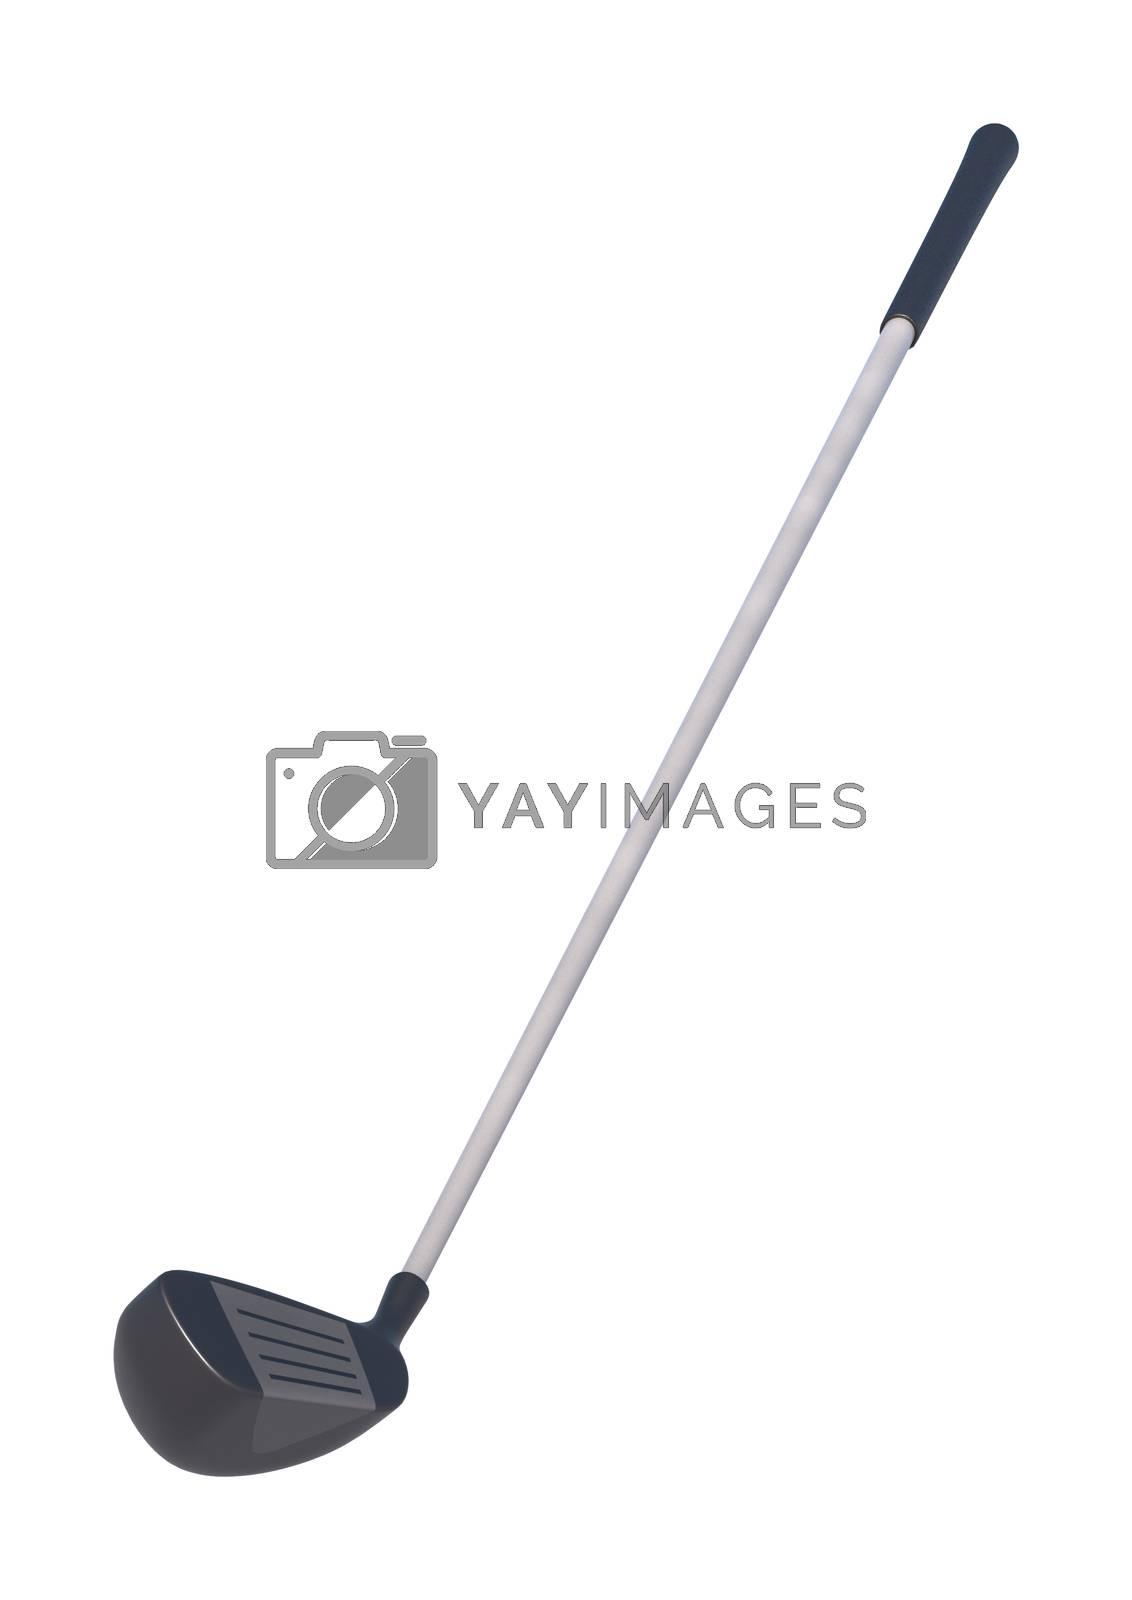 Royalty free image of Golf Club by Vac